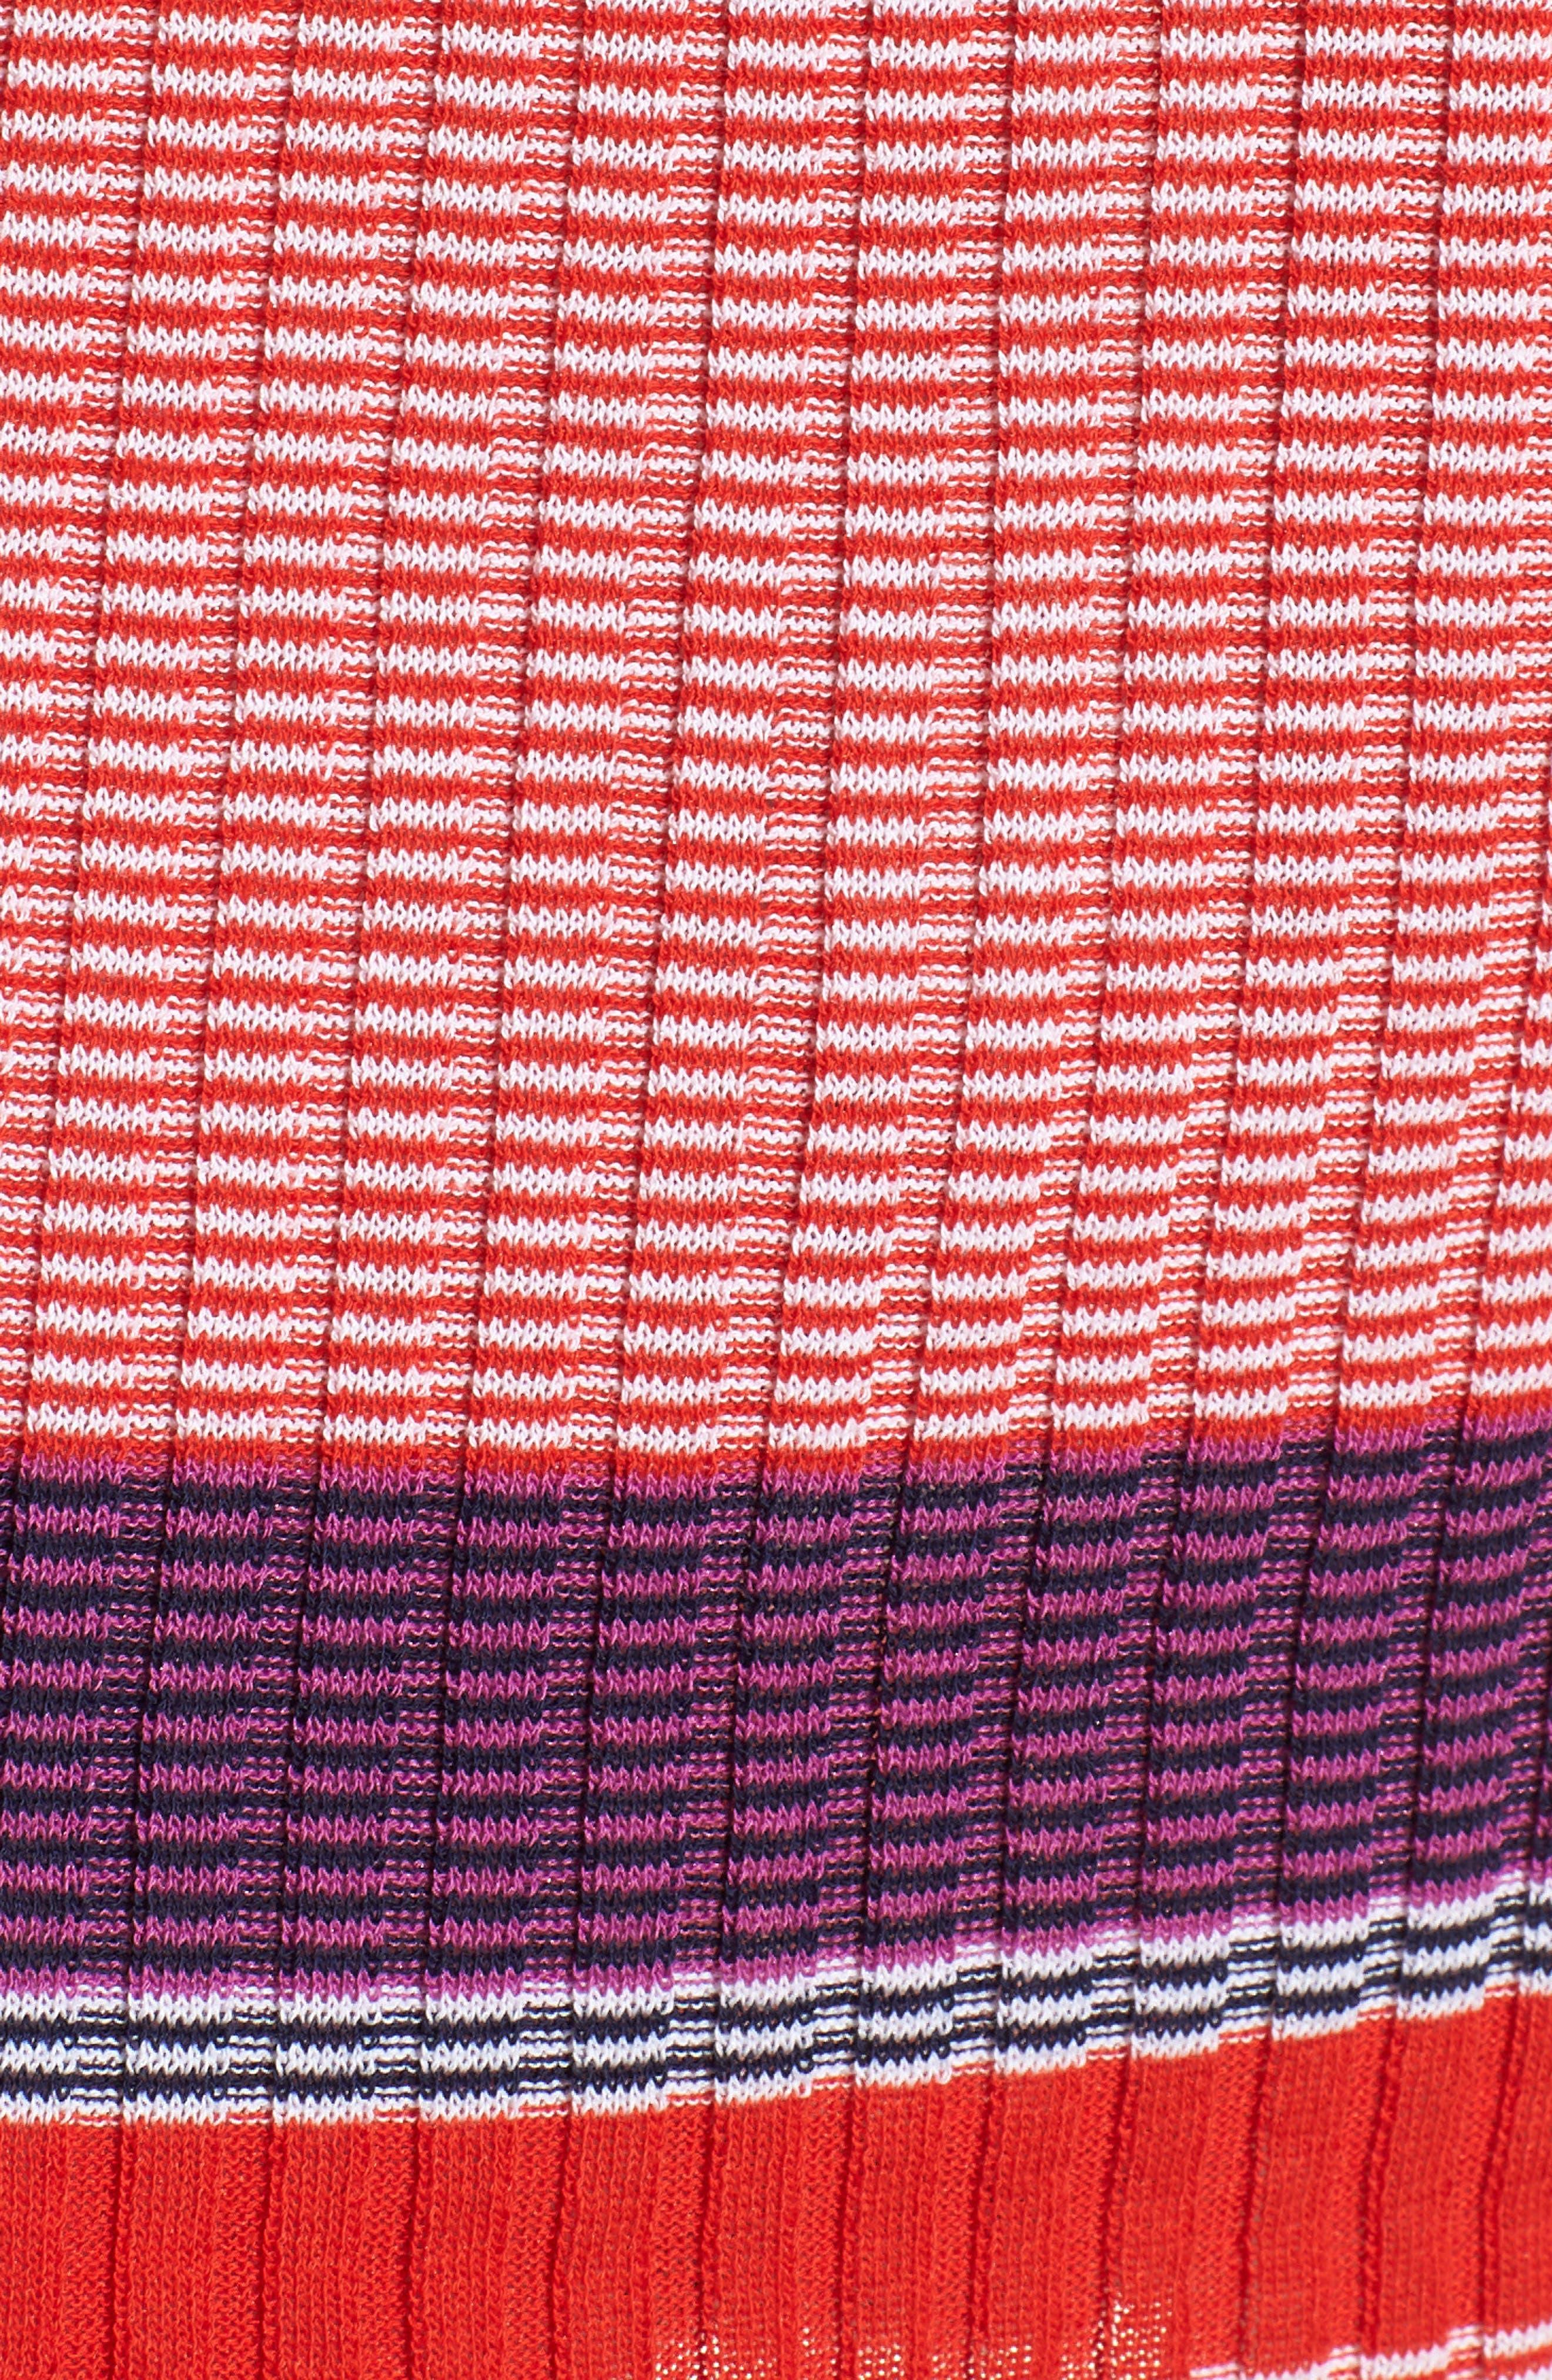 Fantonia Stripe Knit Sheath Dress,                             Alternate thumbnail 6, color,                             Black Fantasy